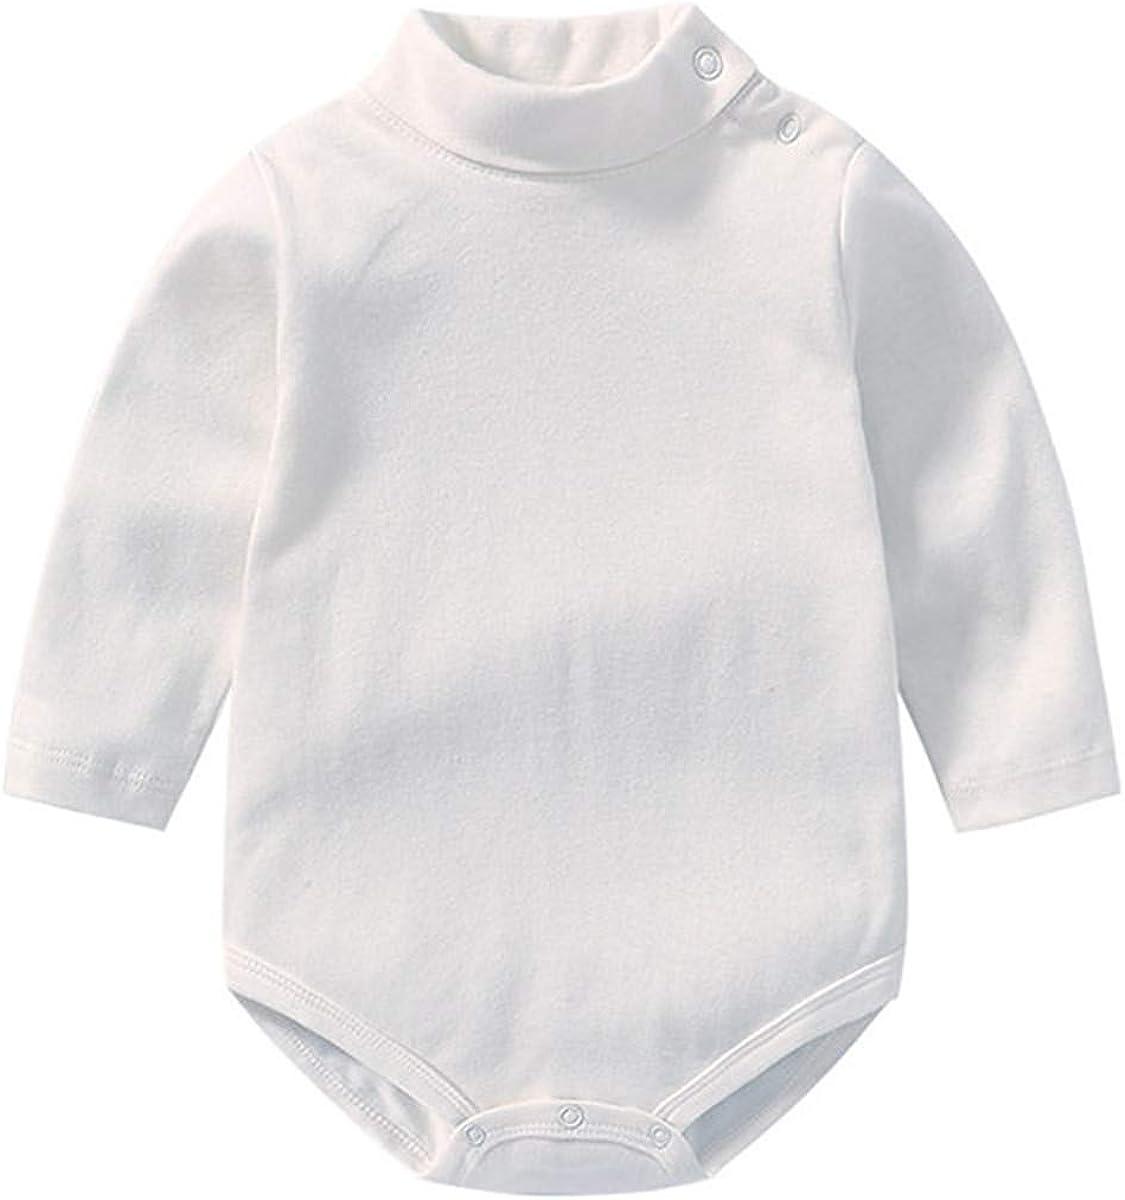 CHRONSTYLE BabyTurtleneck Bodysuit Boys Girls High Collar Long Sleeve Romper Jumpsuit